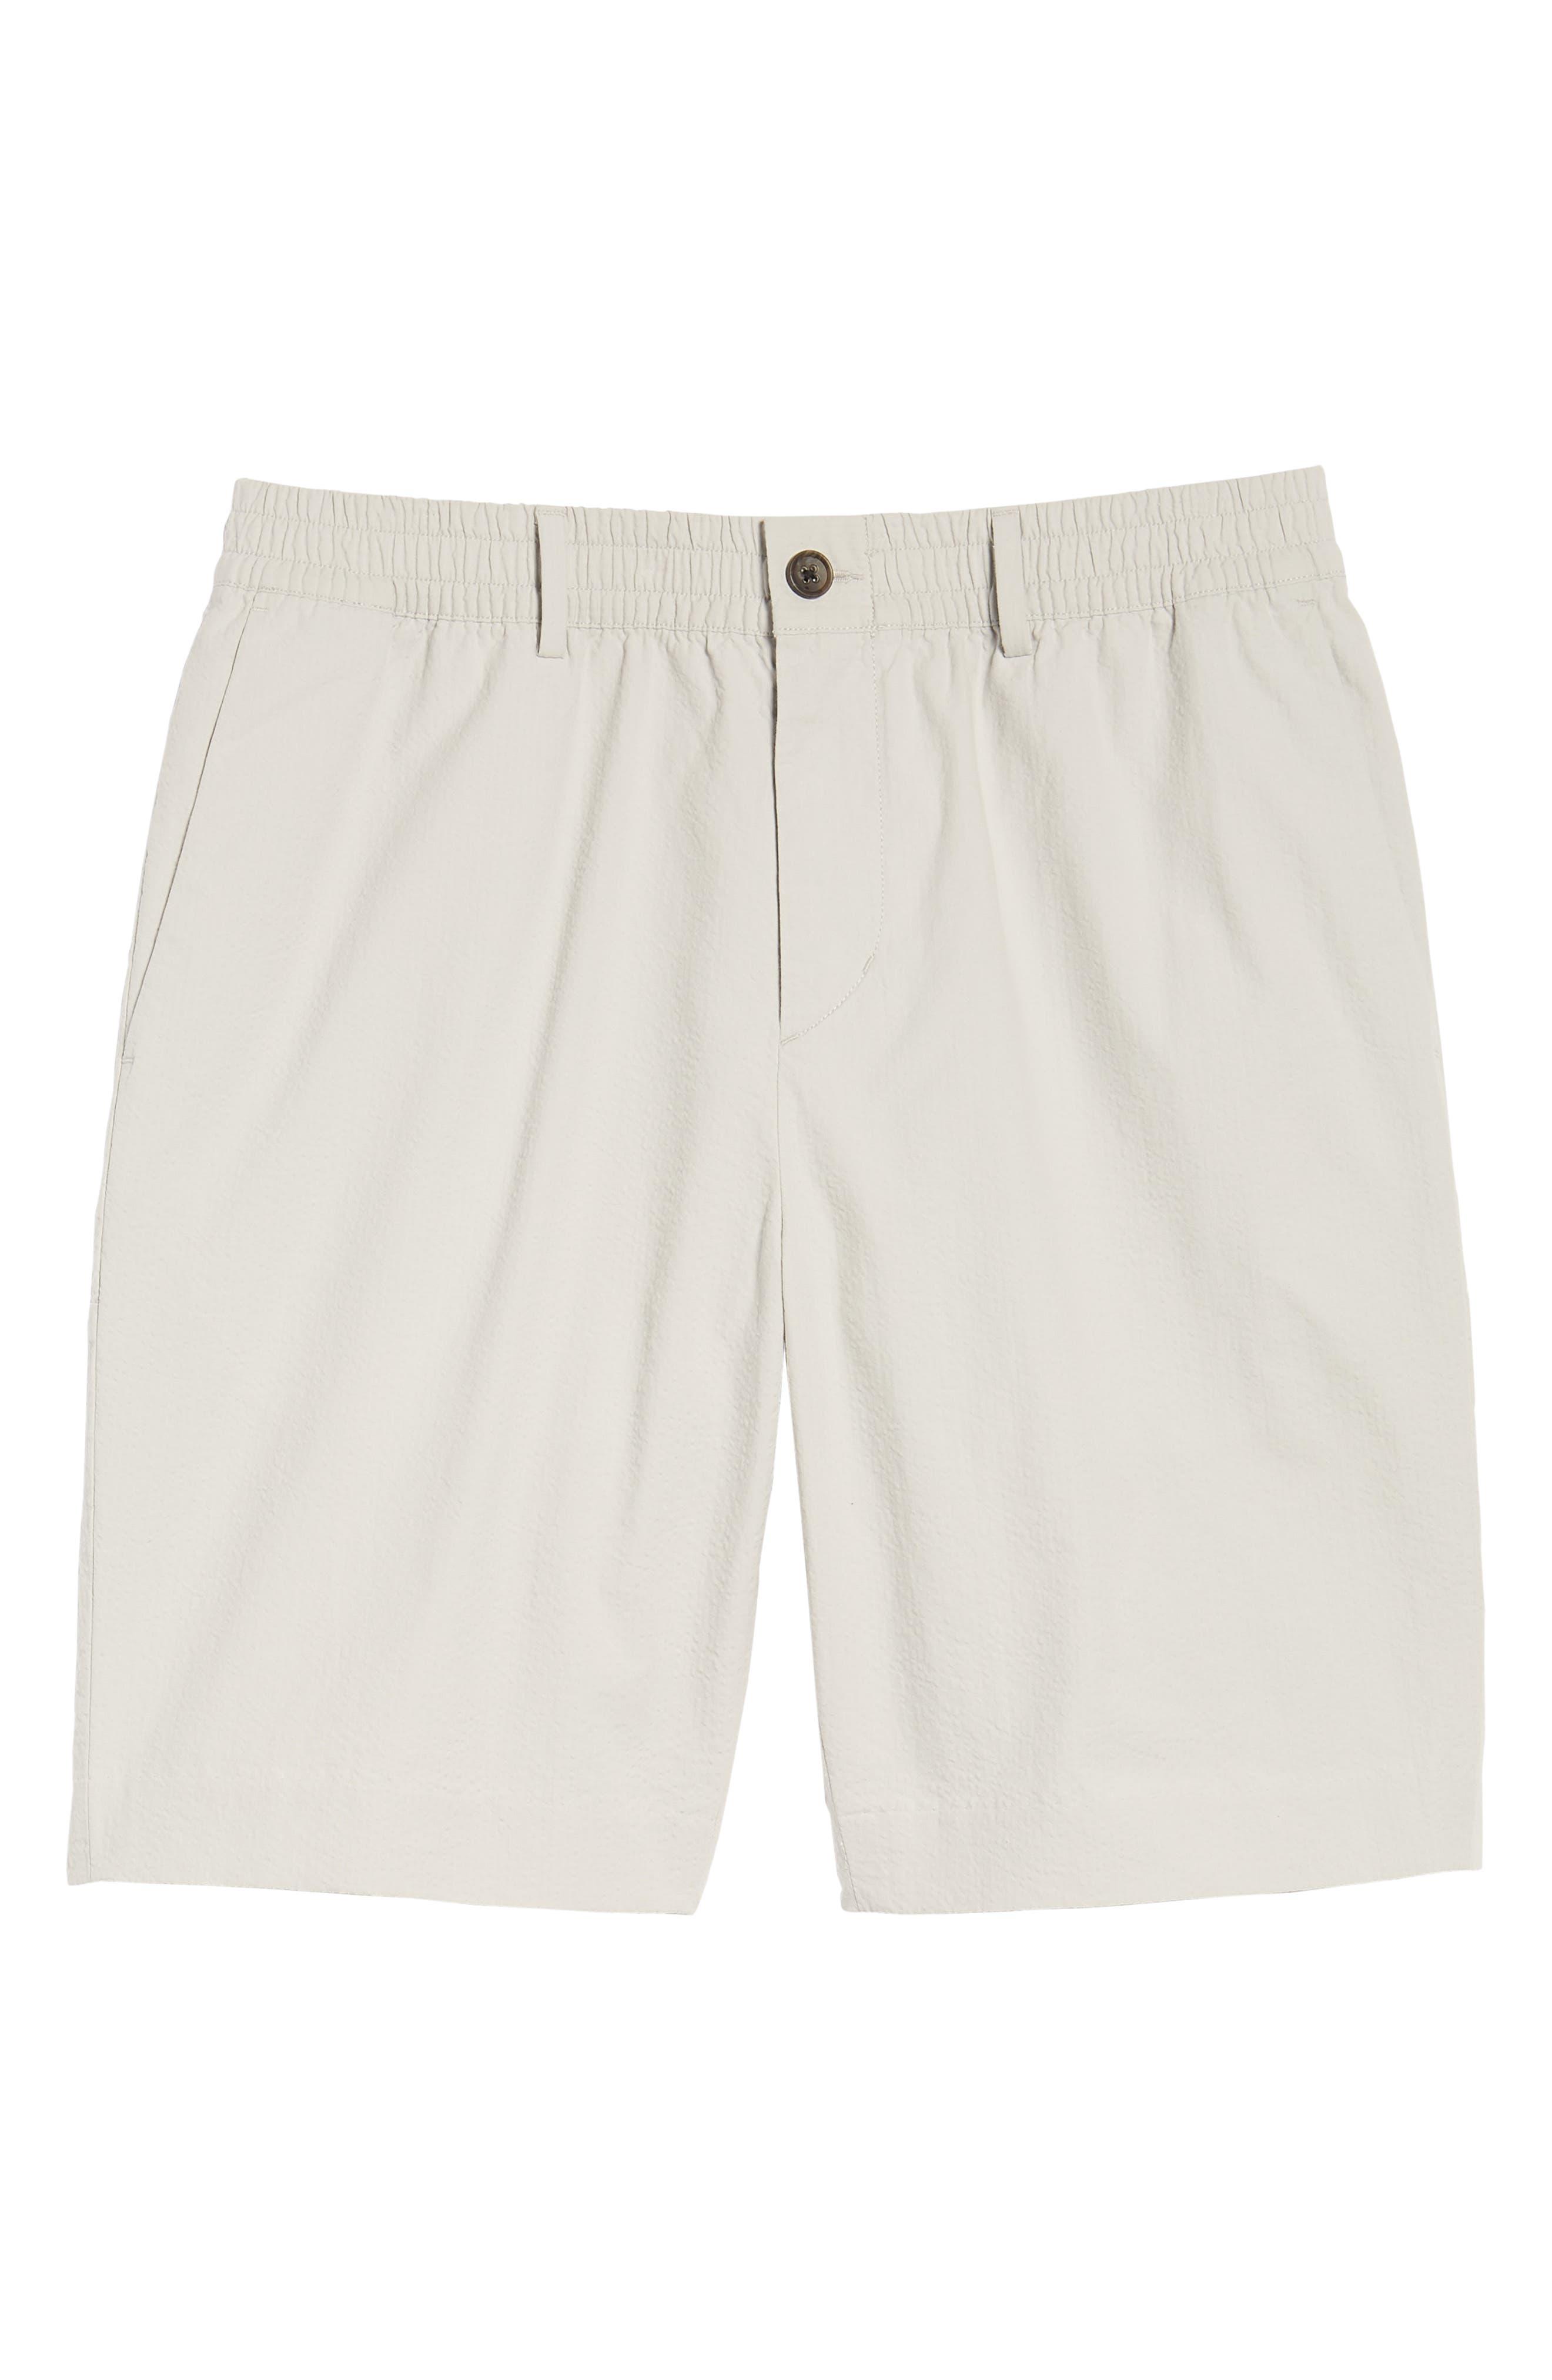 Elastic Waist Seersucker Shorts,                             Alternate thumbnail 6, color,                             030